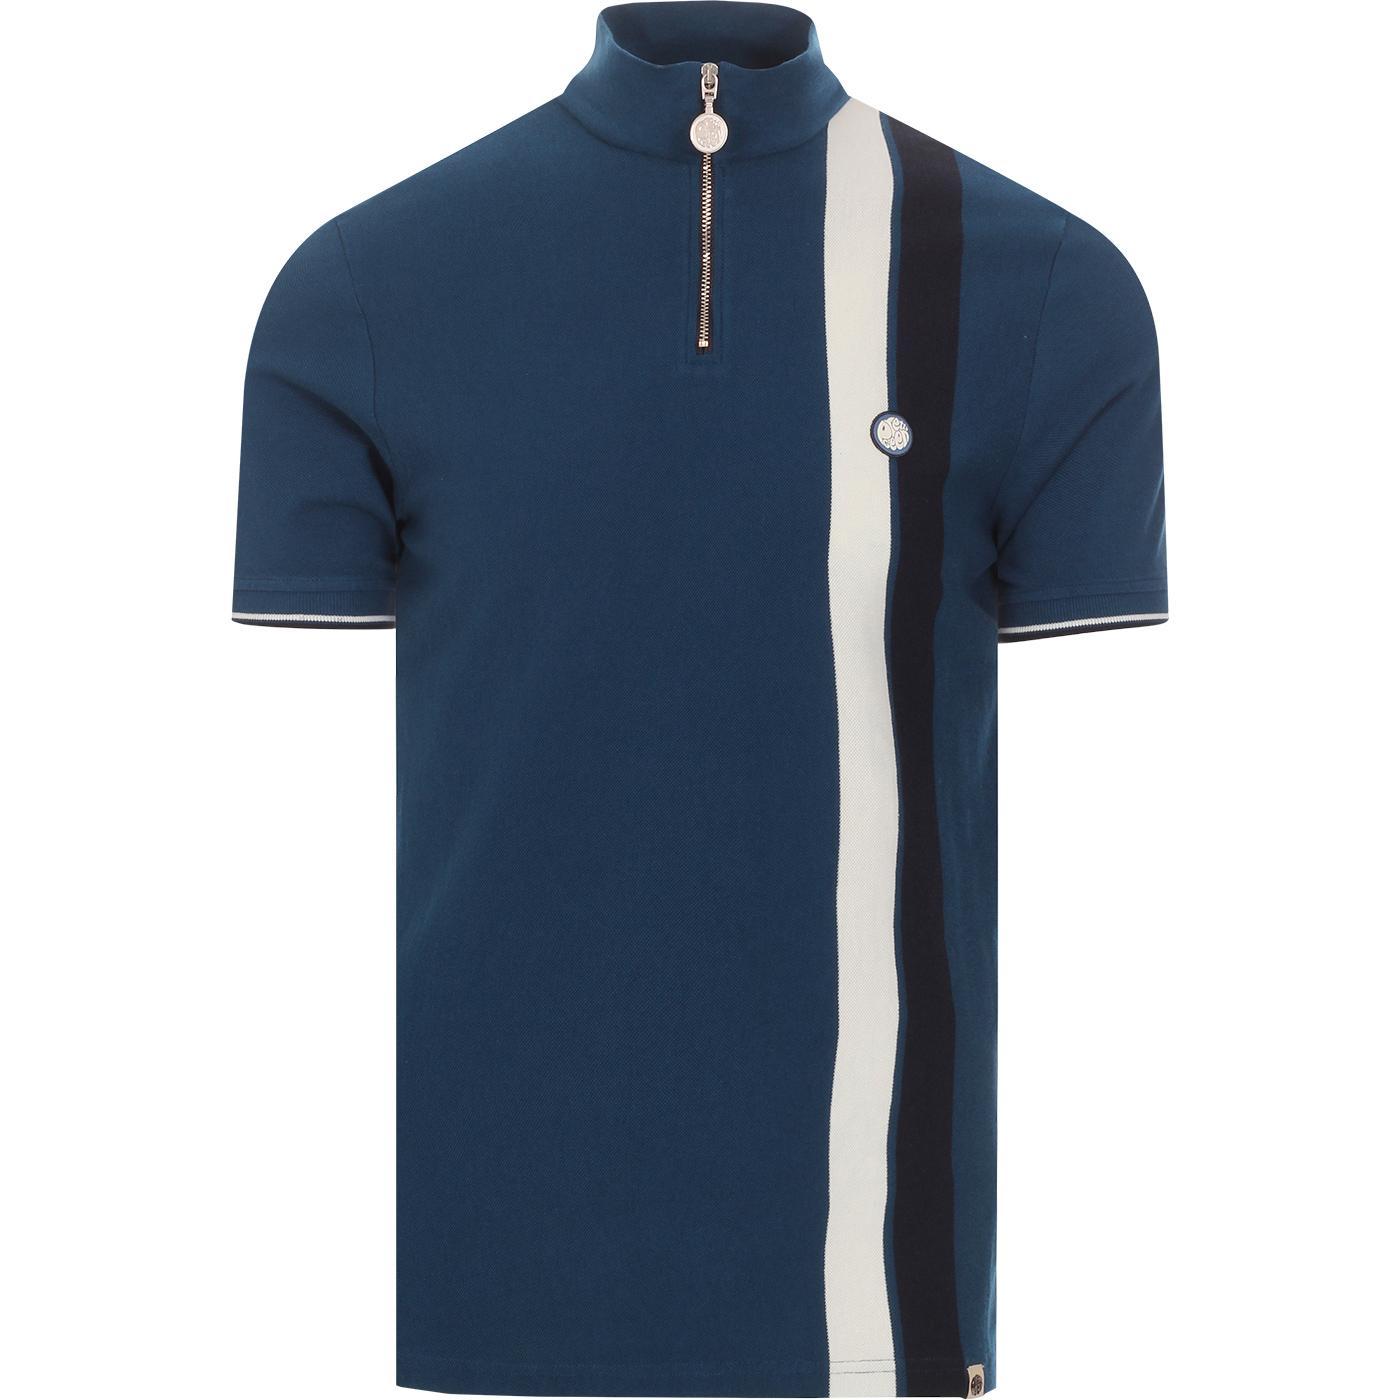 PRETTY GREEN Racing Stripe Zip Cycling Top (Blue)